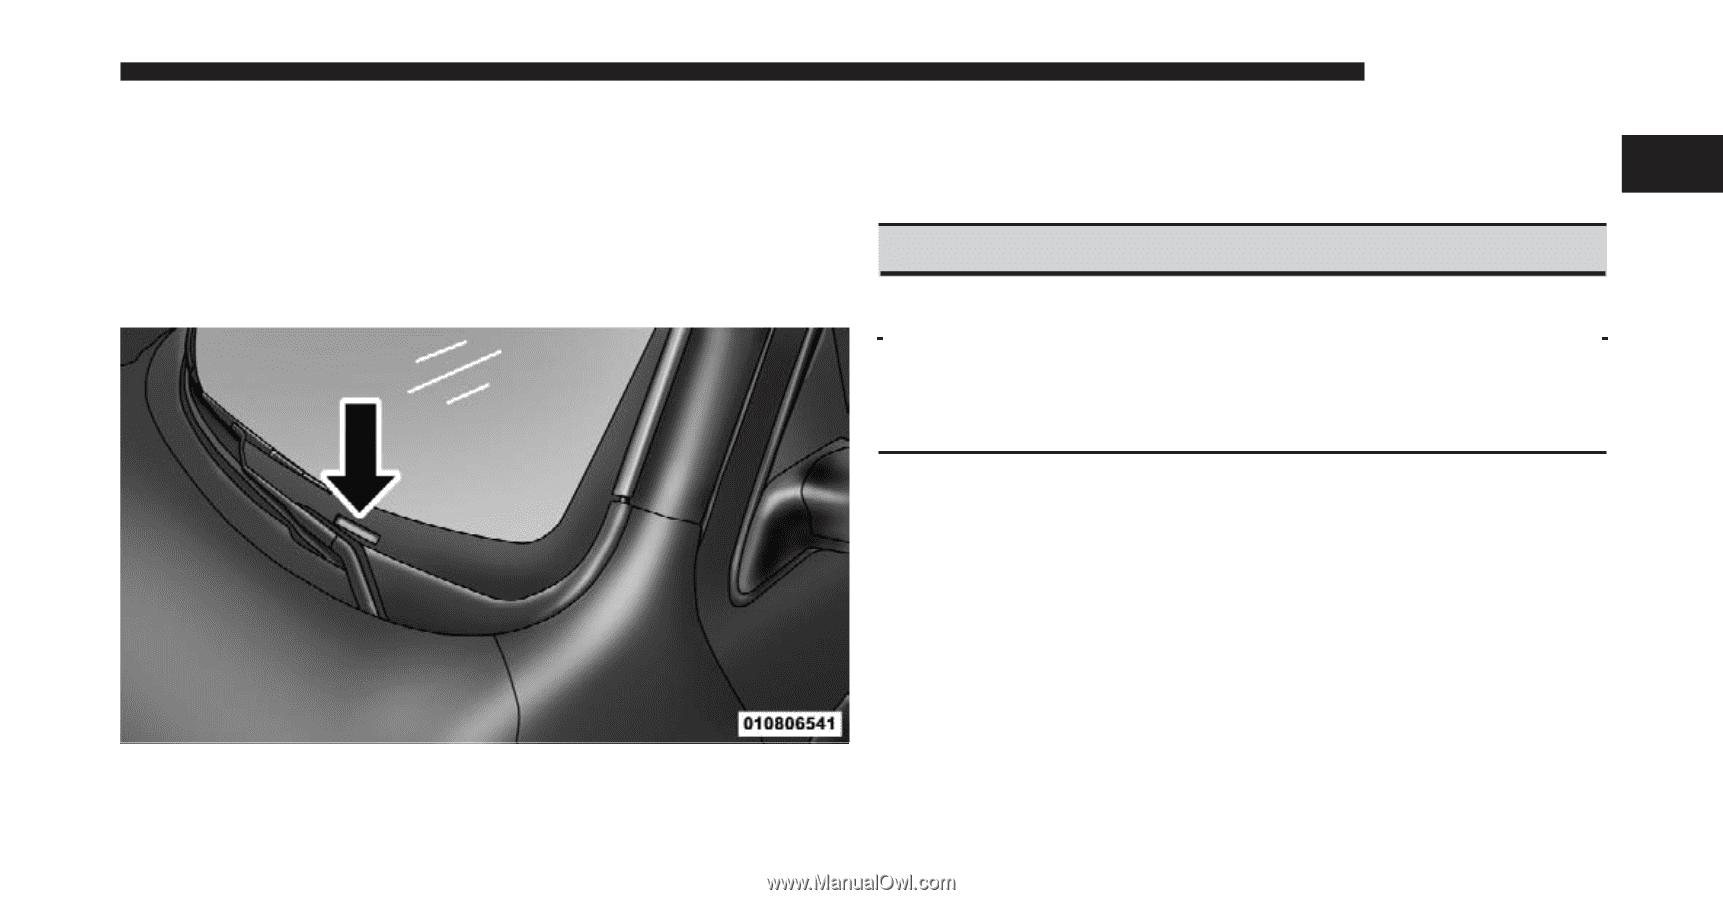 2009 Dodge Ram 1500 Pickup Owner Manual 2009 Ram 1500 Fuse Box Batt Presafe